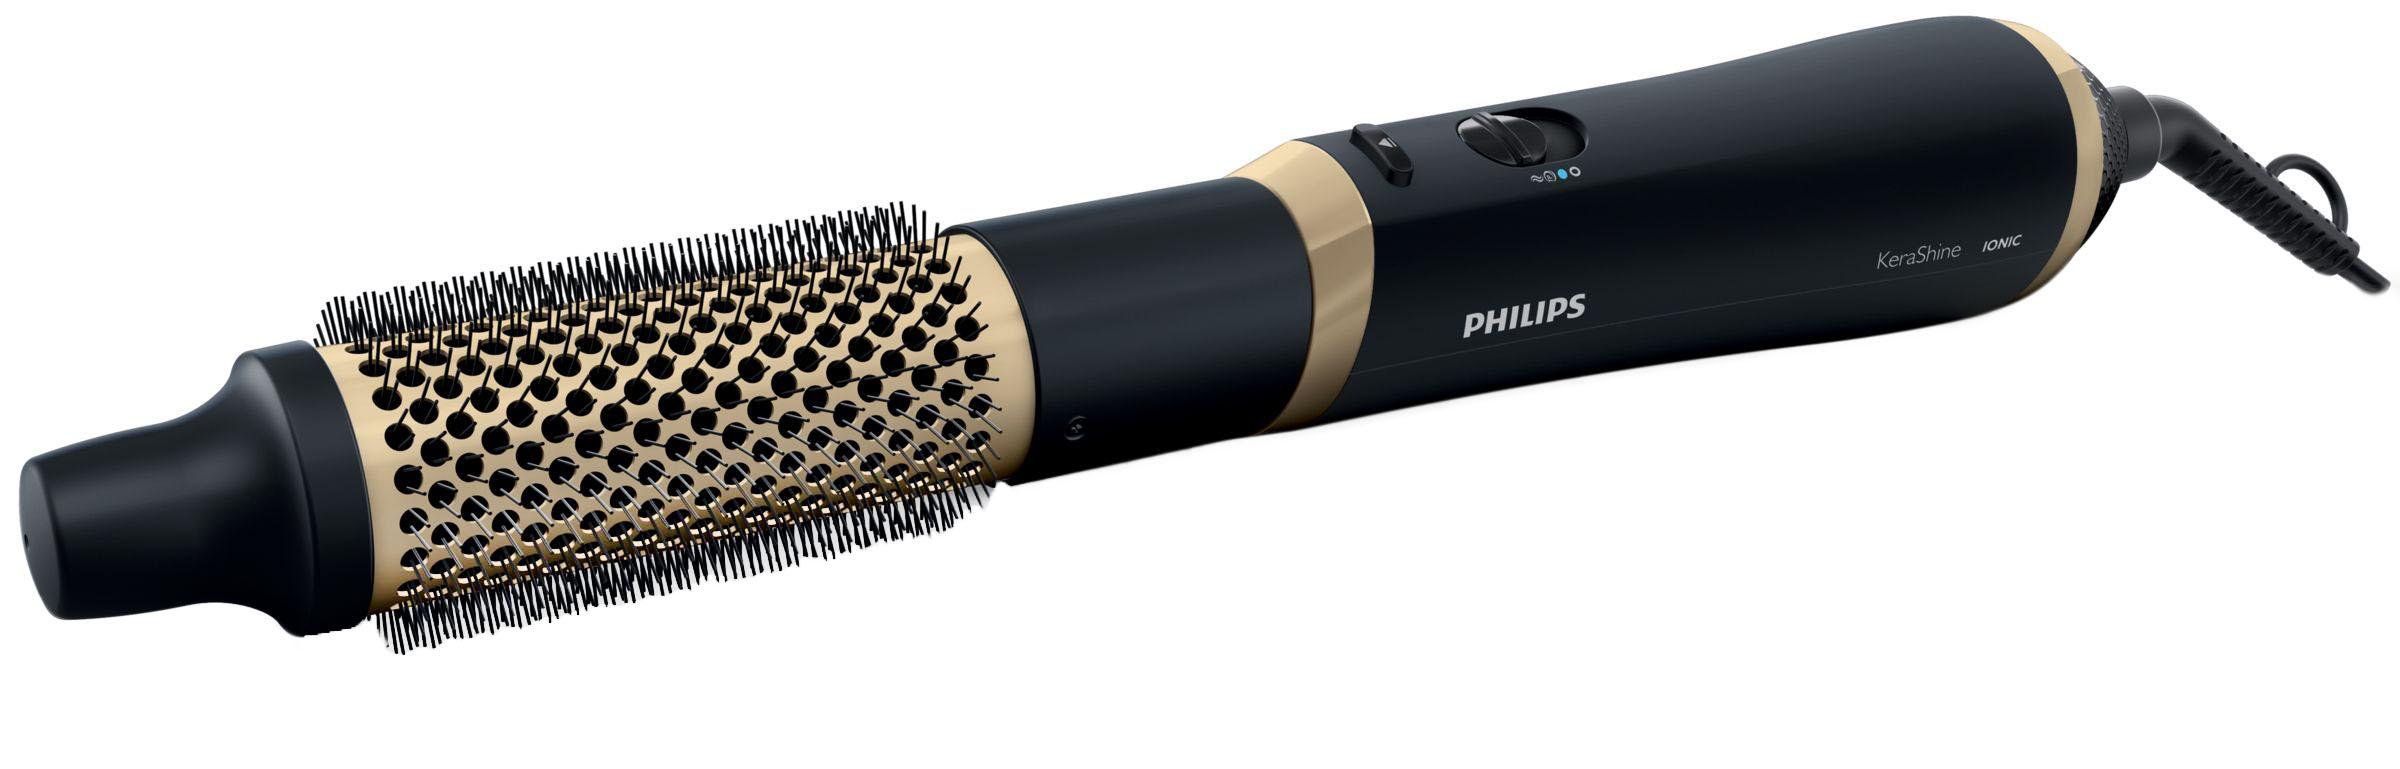 Фен щетка Philips Care HP8667/00 Black/Gold